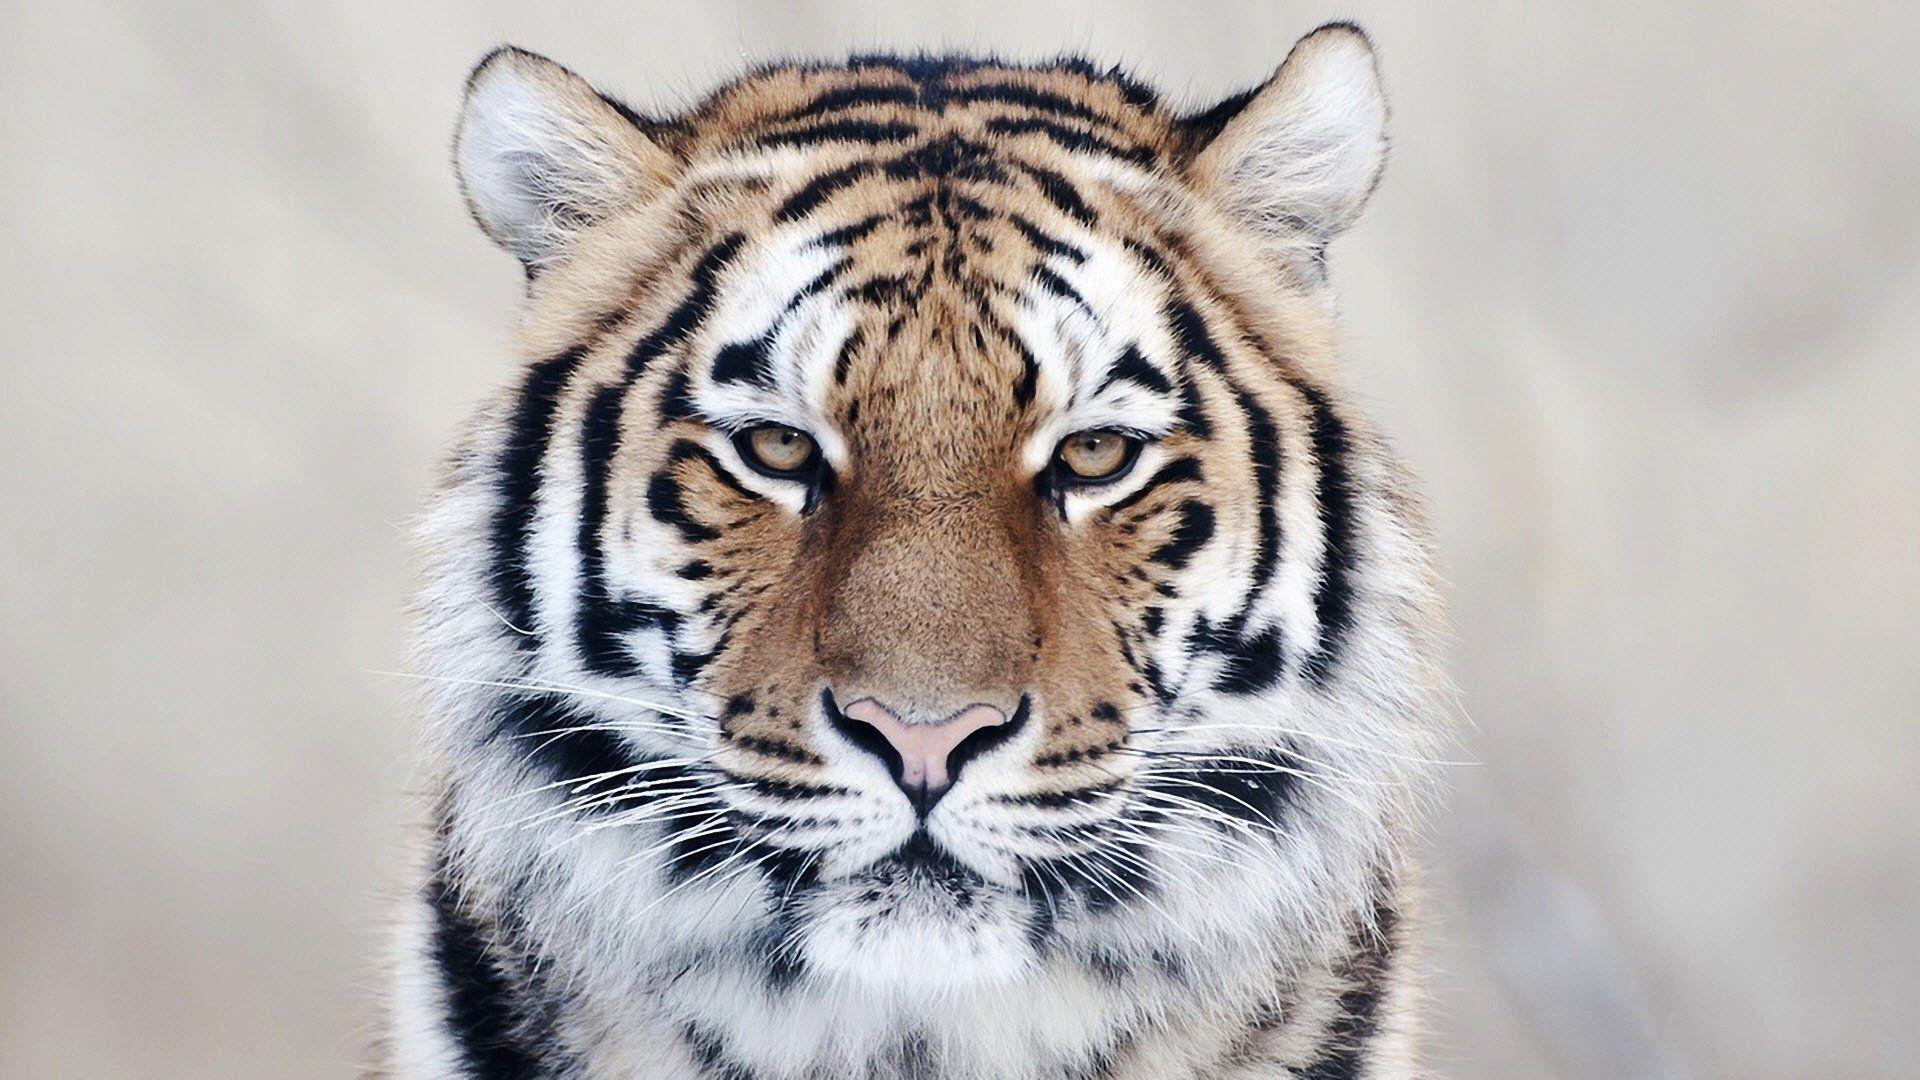 Tiger, Background Wallpaper